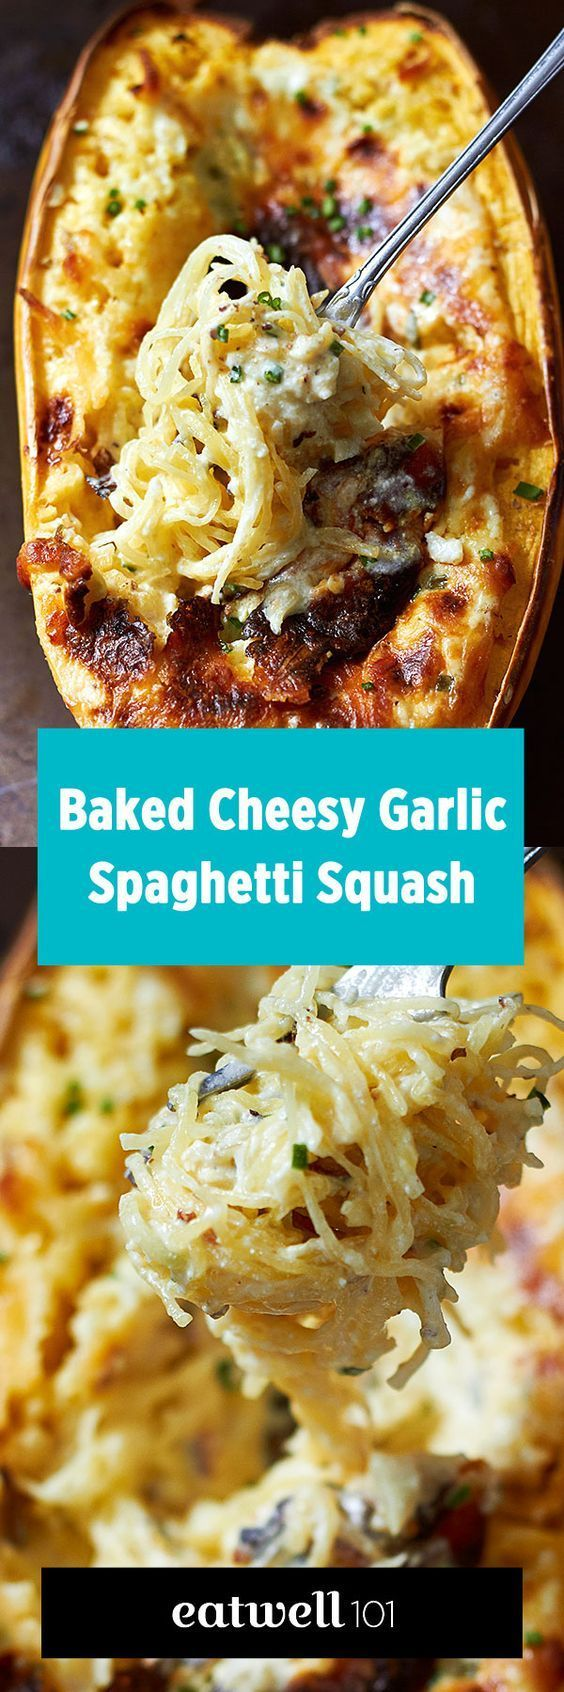 Spaghetti squash, Garlic spaghetti and Spaghetti squash recipes on ...